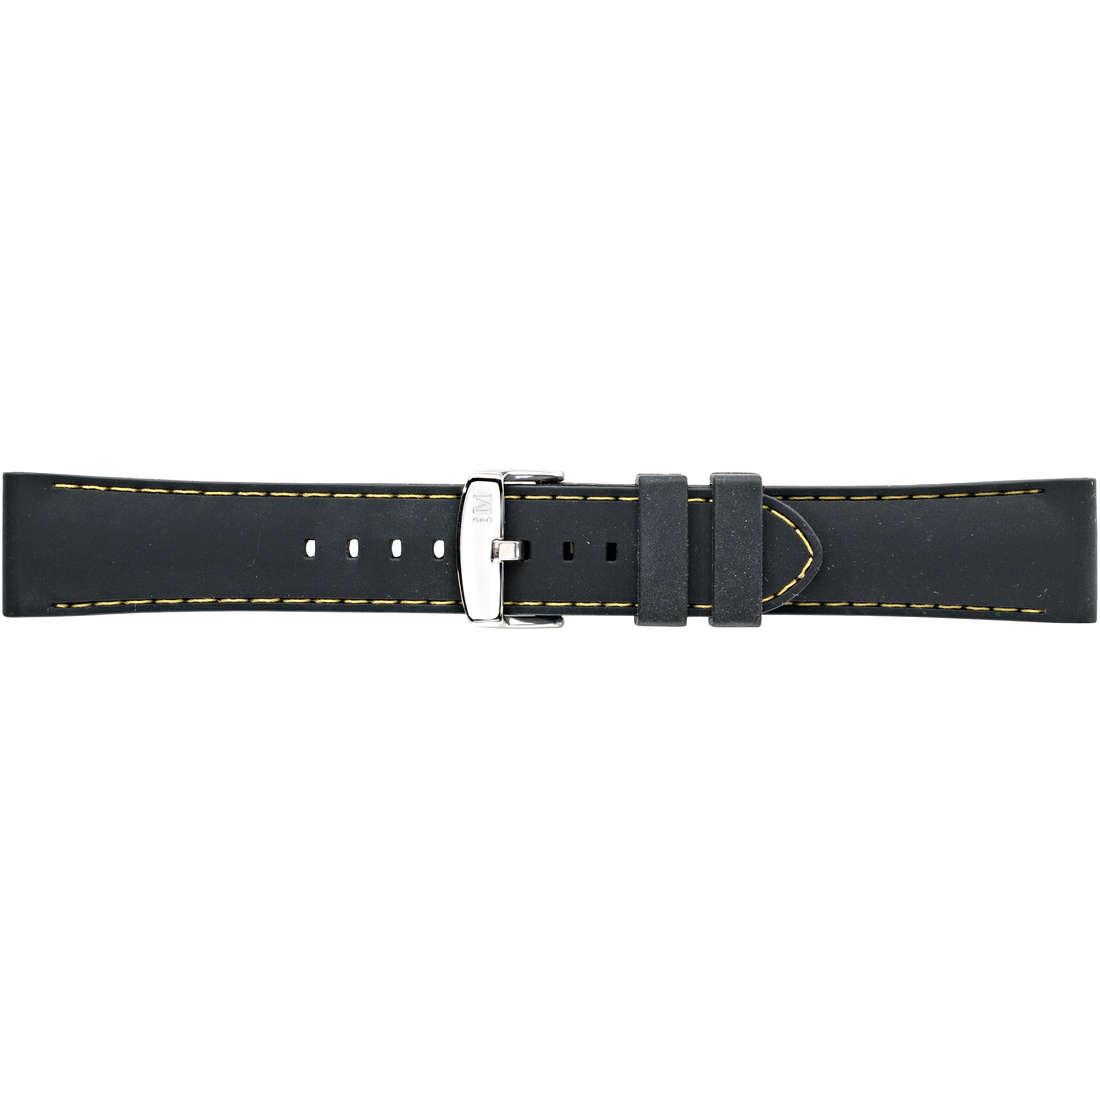 watch watch bands watch straps man Morellato Technogomma A01U3844187897CR22